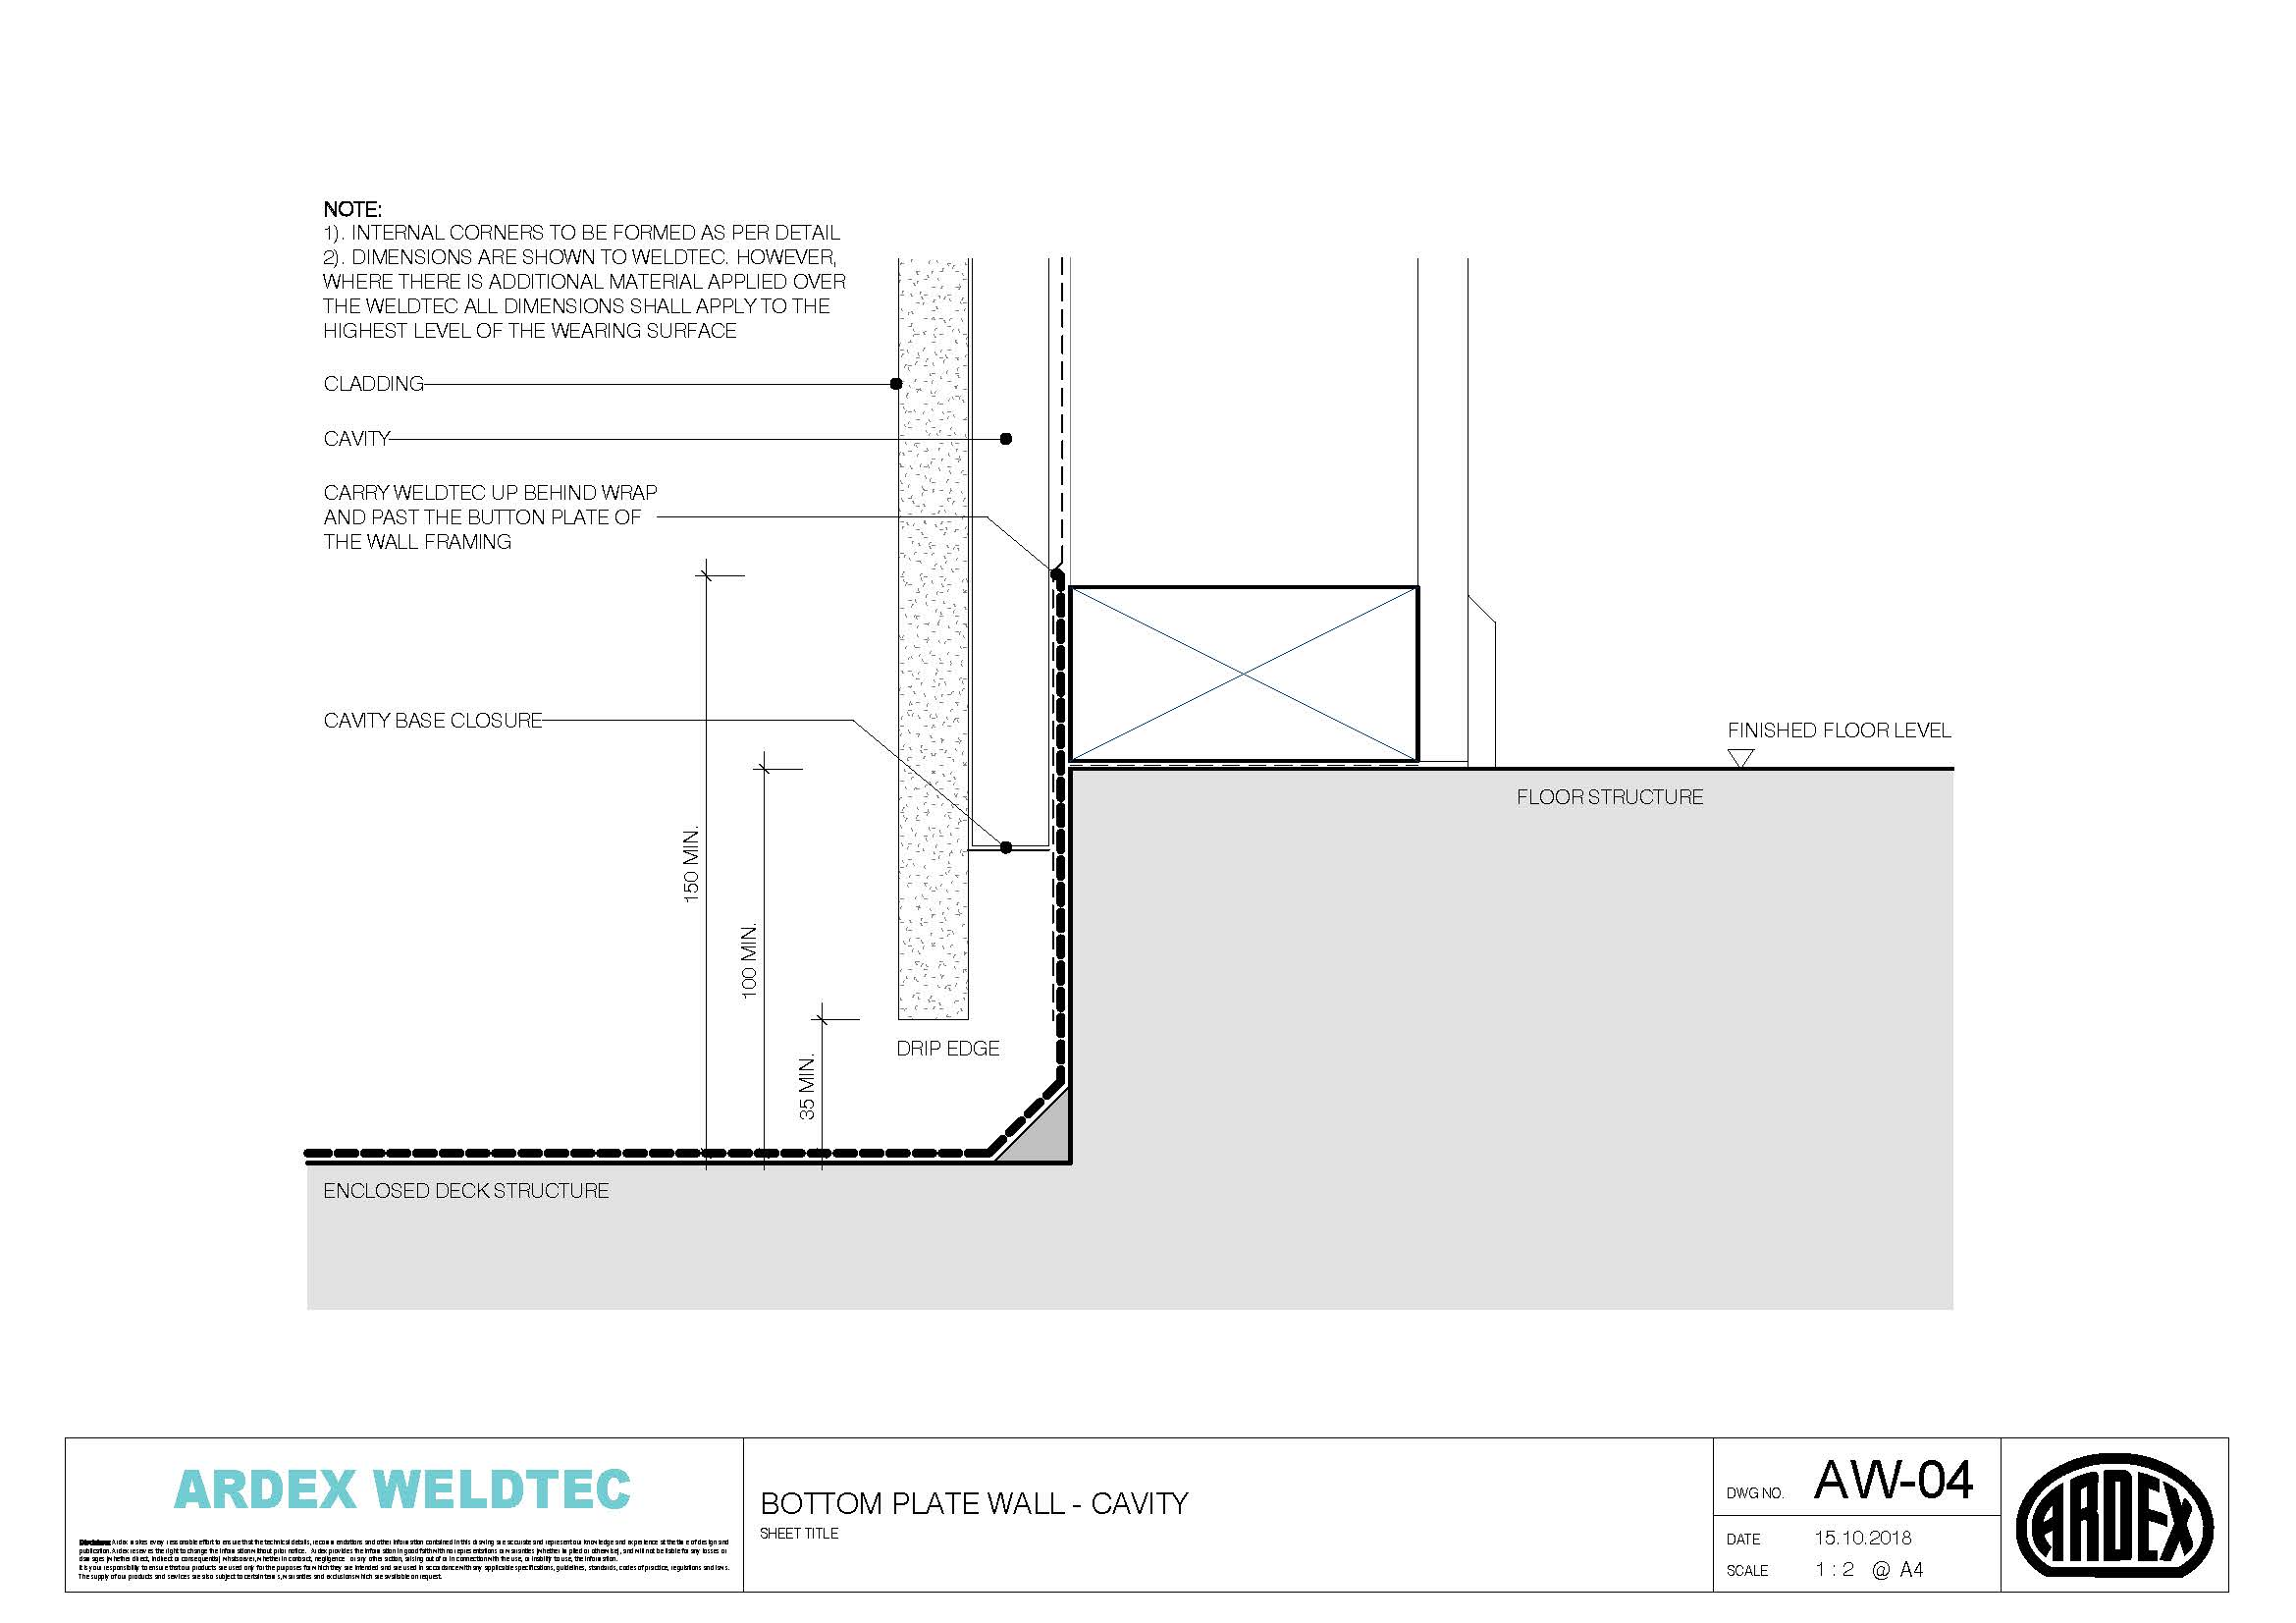 Weldtec bottom plate wall cavity